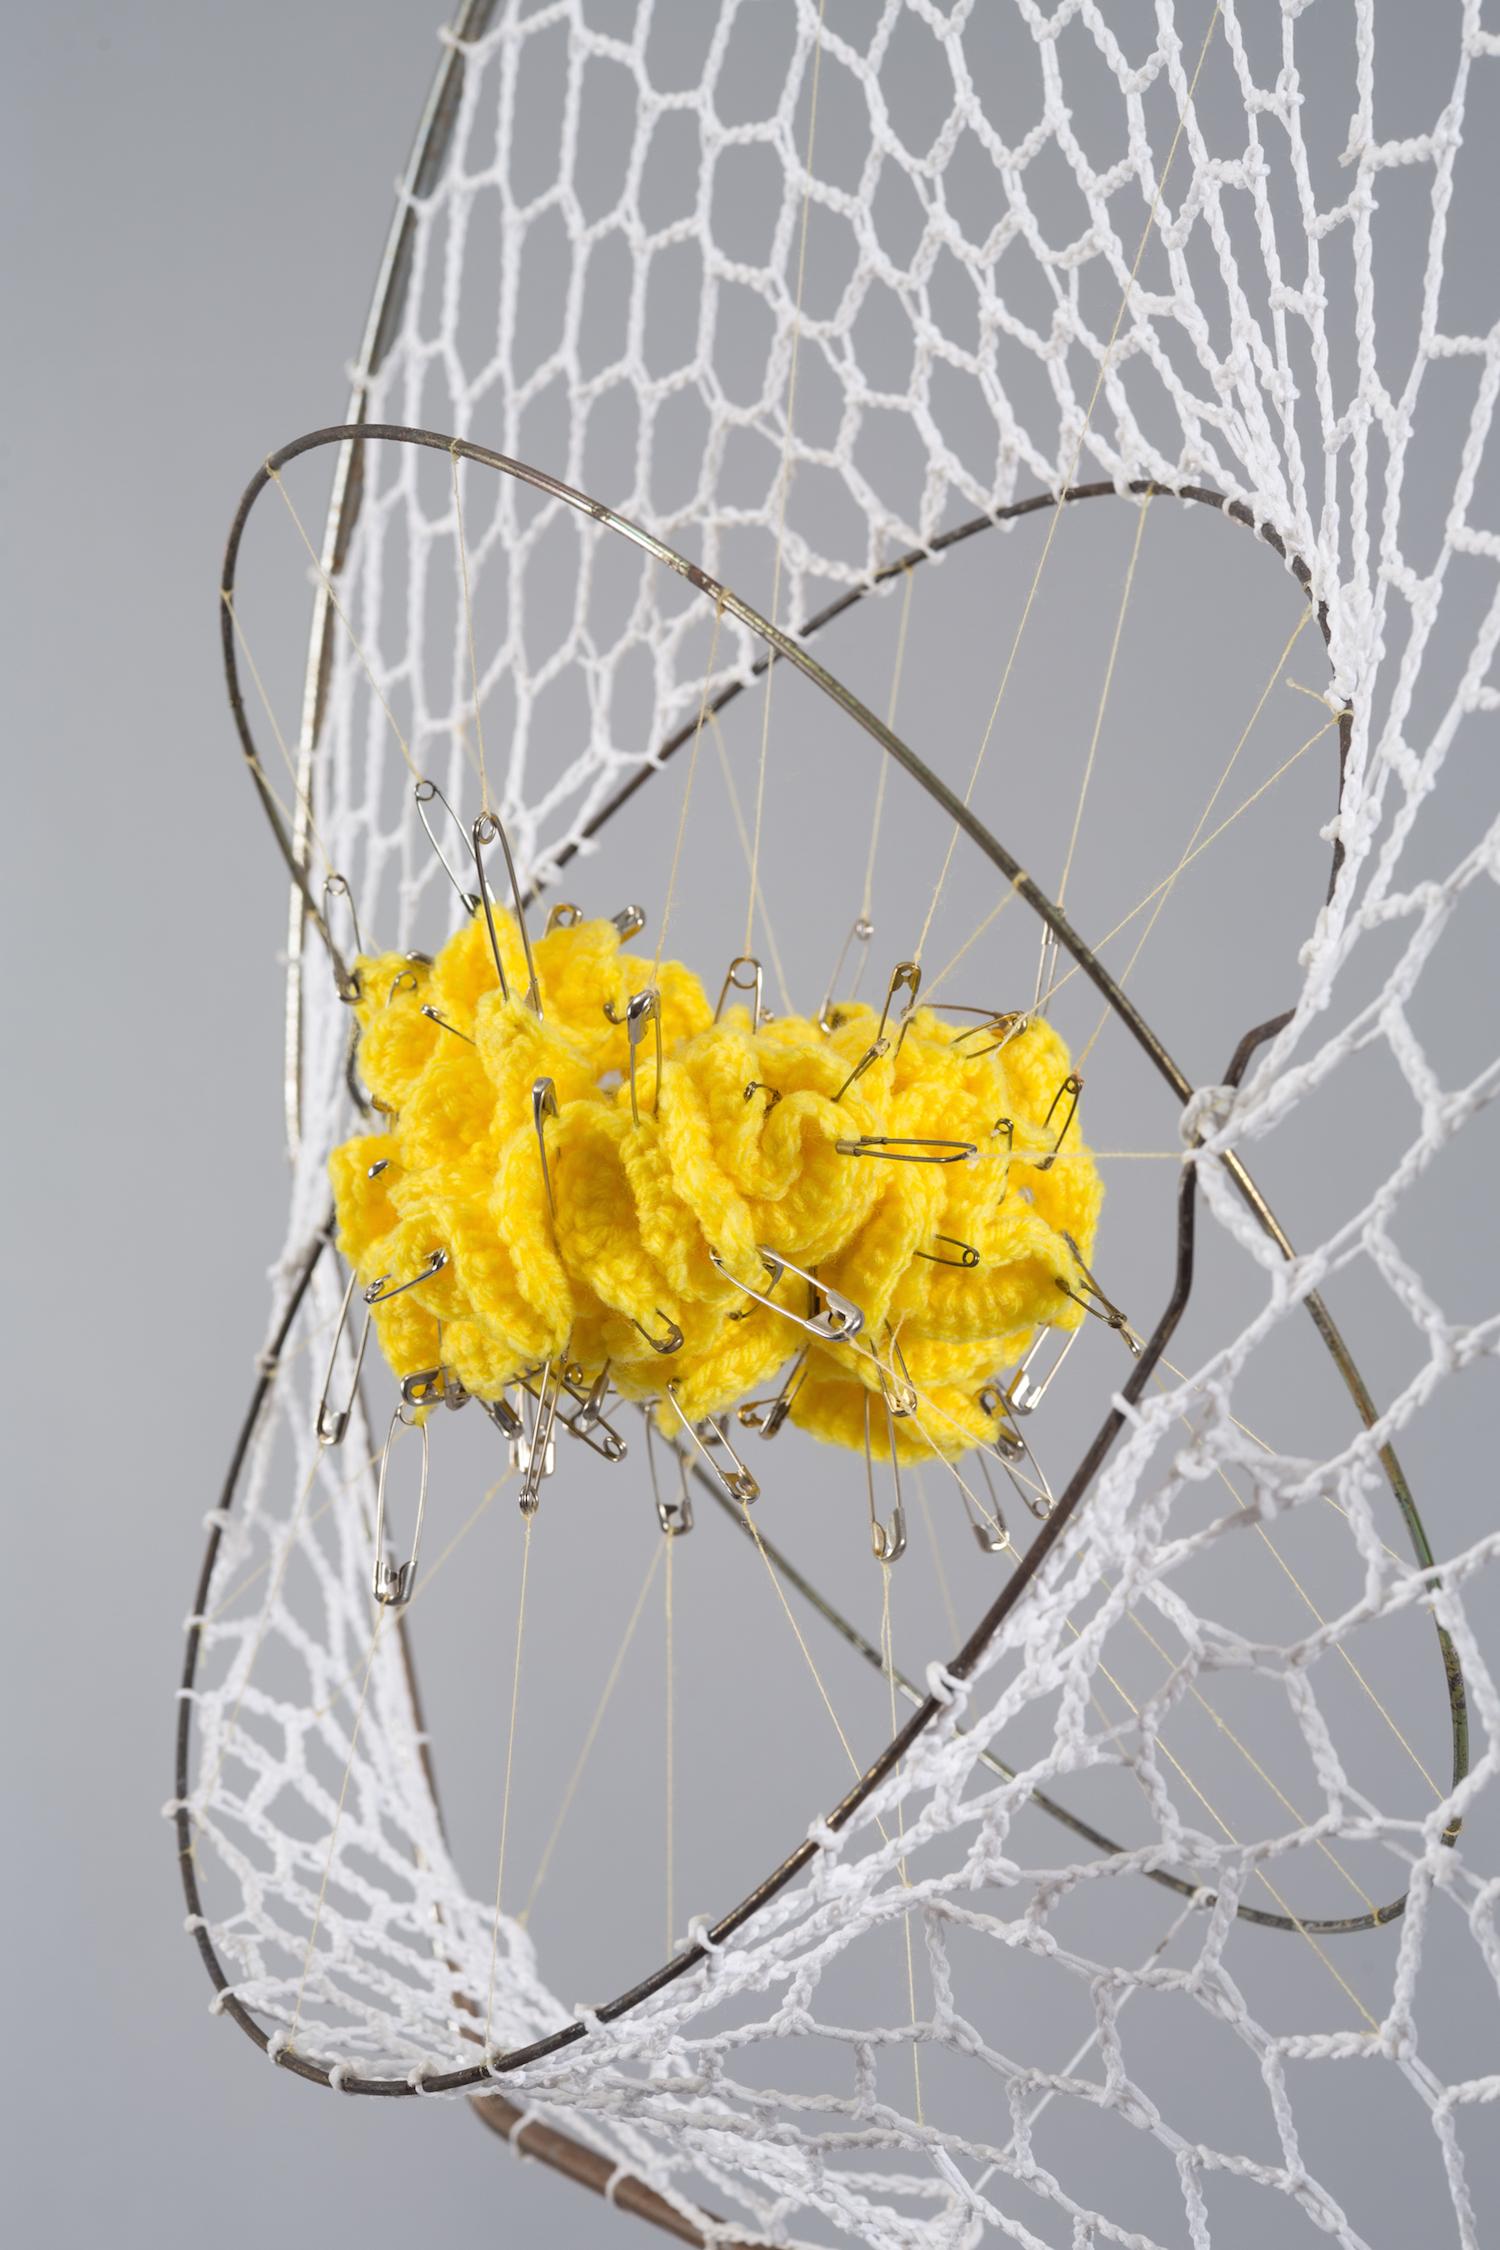 Canary, 2017 - Yarn, metal, safety pins